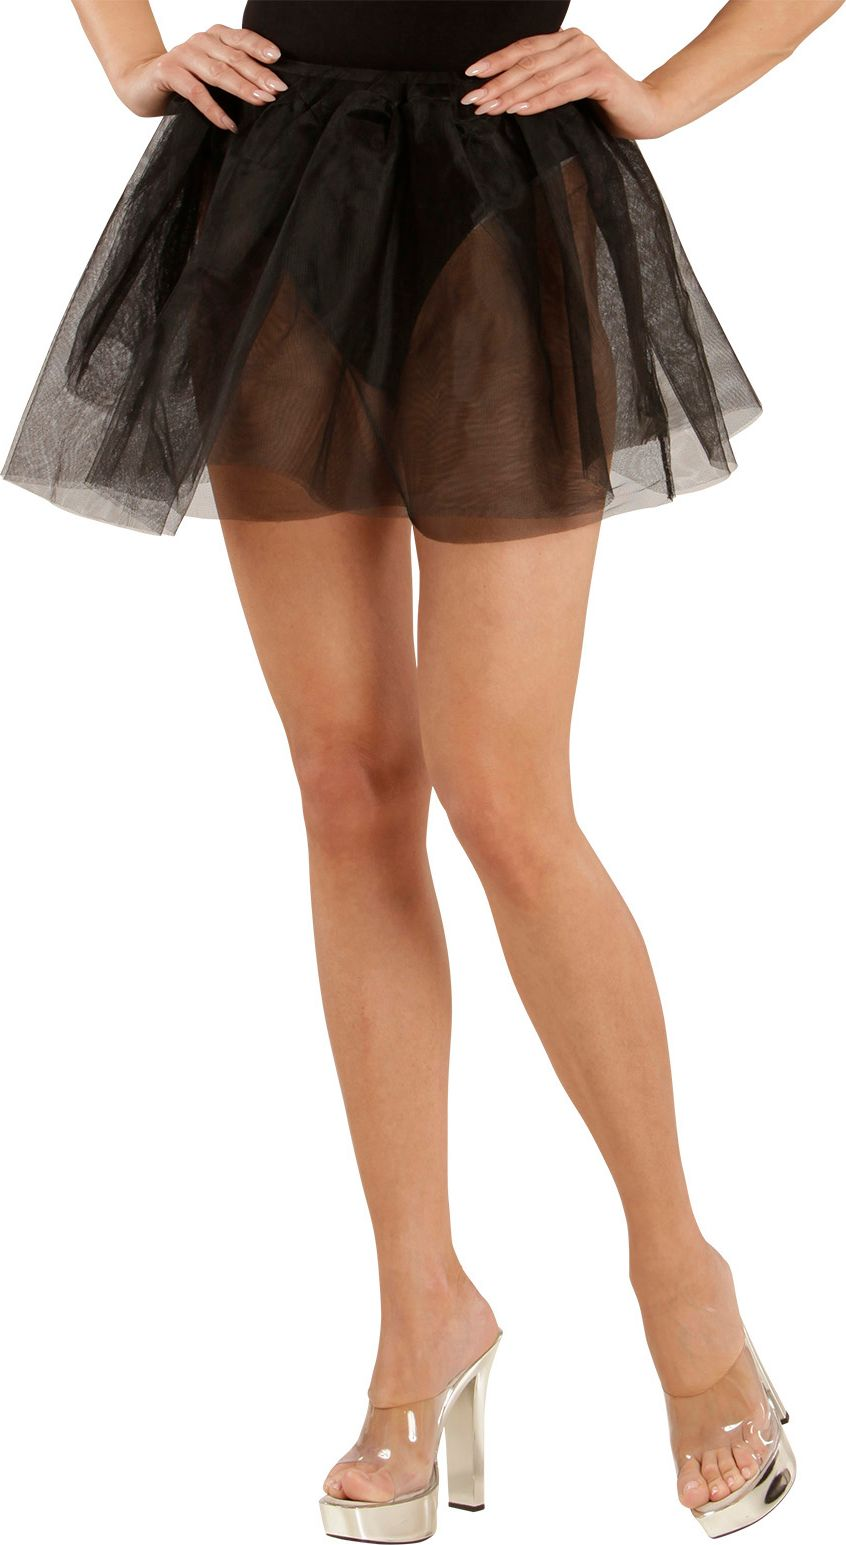 Danseres petticoat zwart One-size-volwassenen